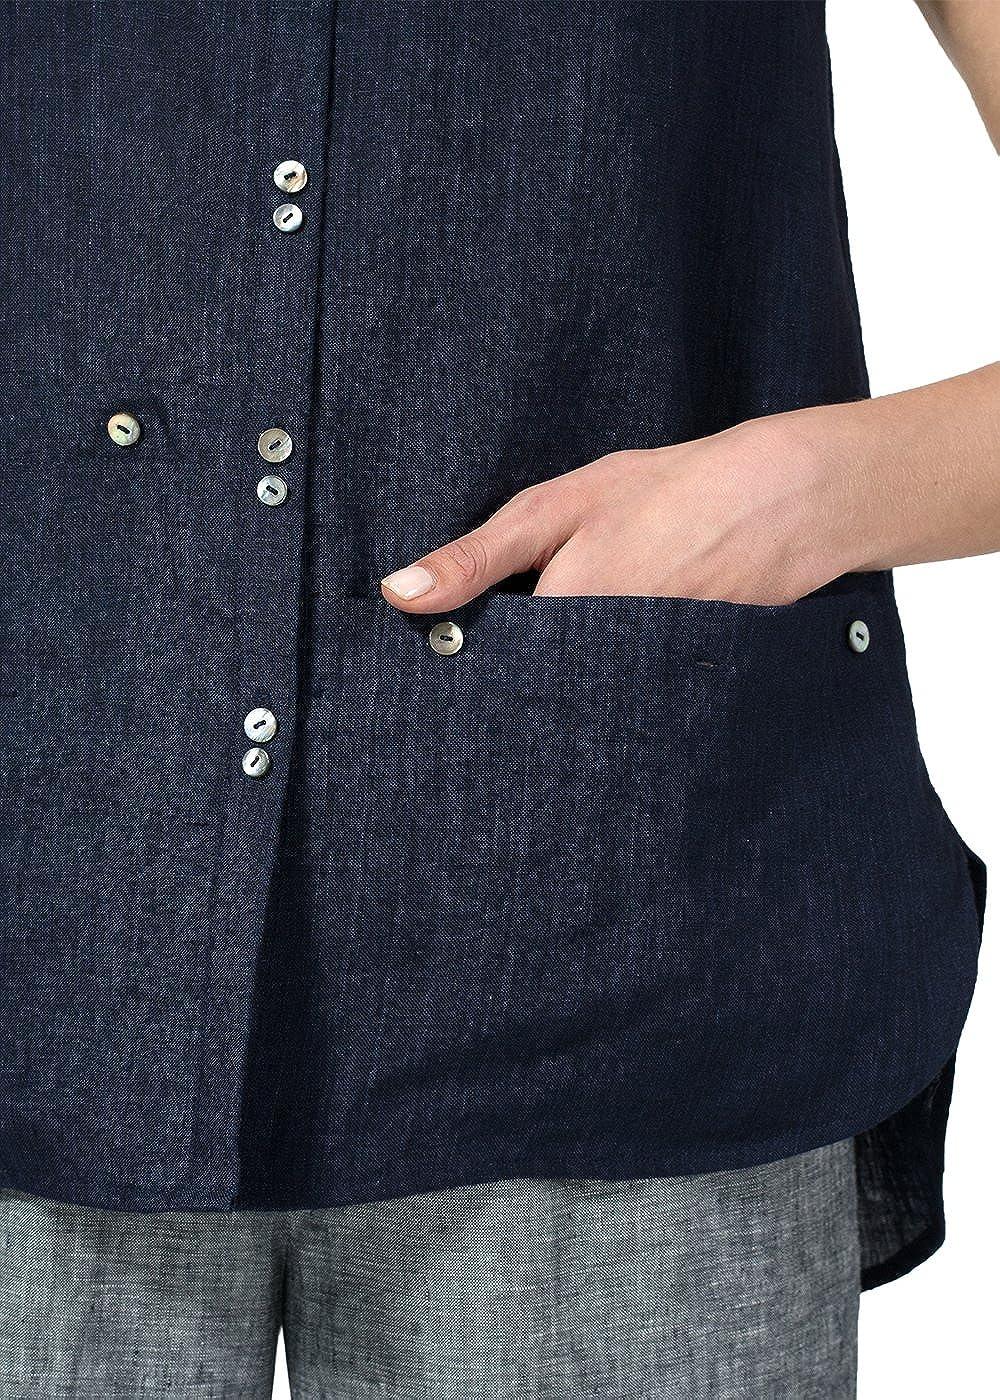 Vivid Linen Cap Sleeve Blouse